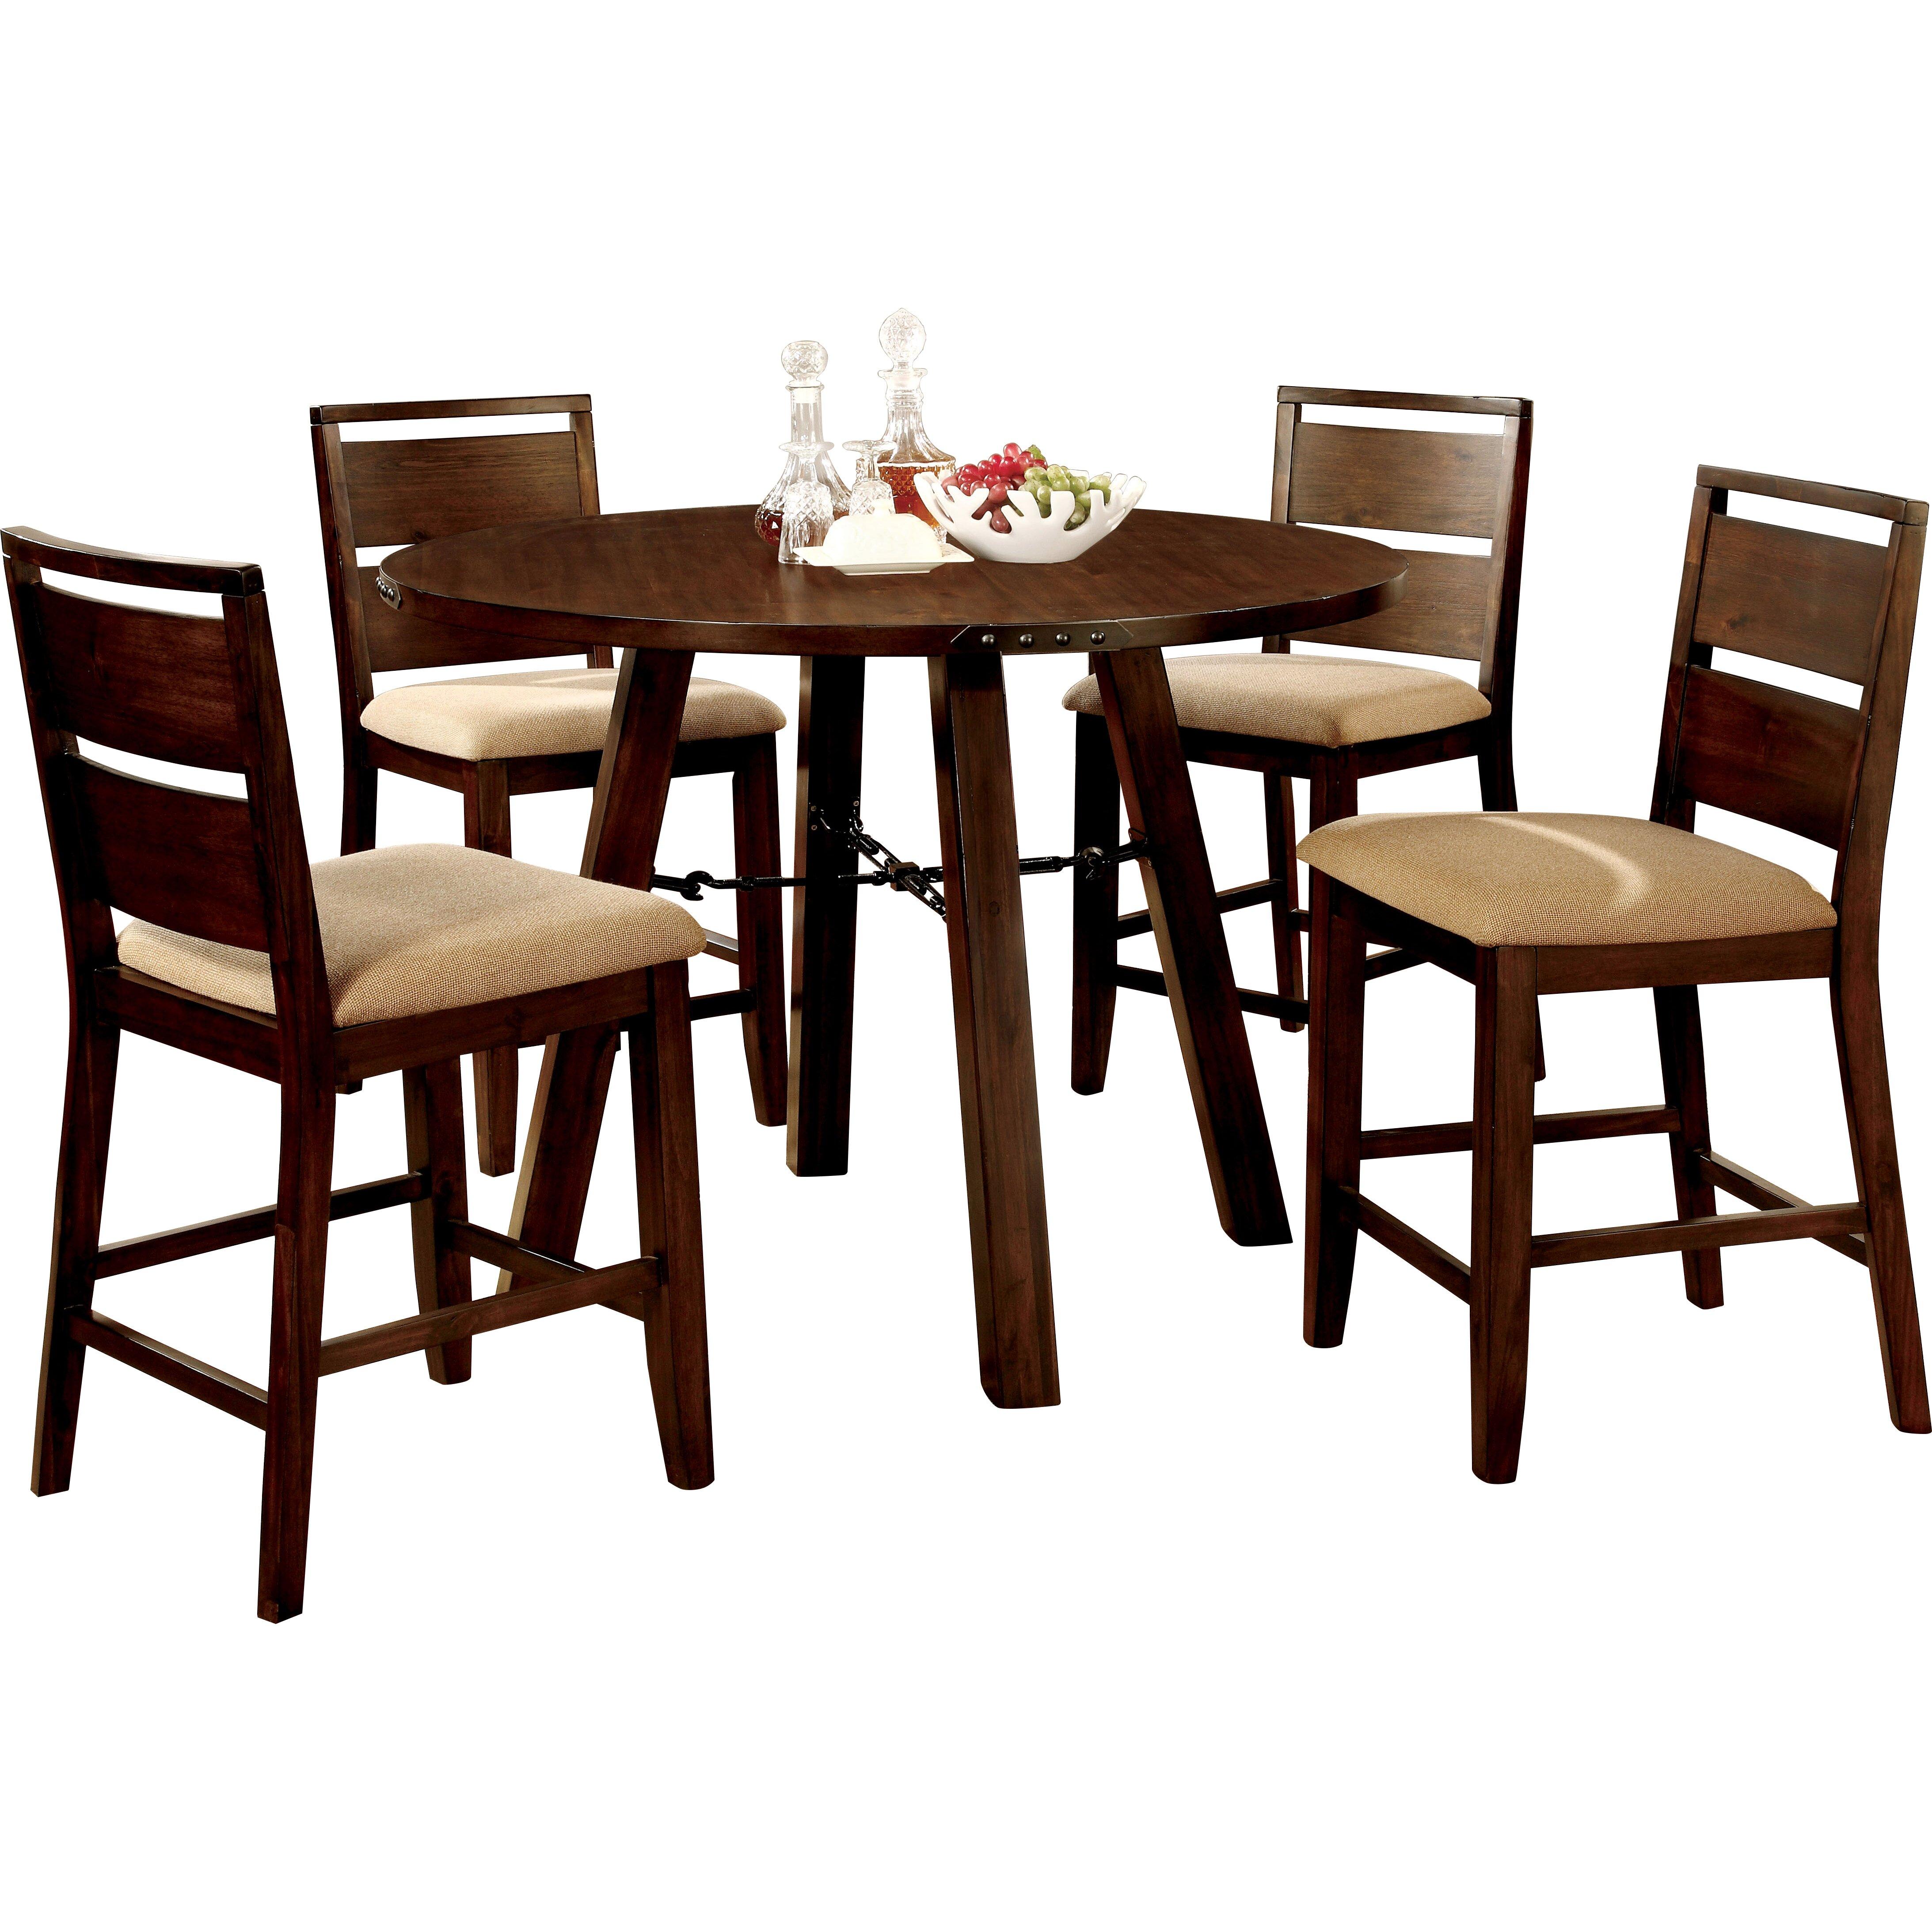 Hokku designs shrader 5 piece dining set reviews wayfair for Hokku designs dining room furniture